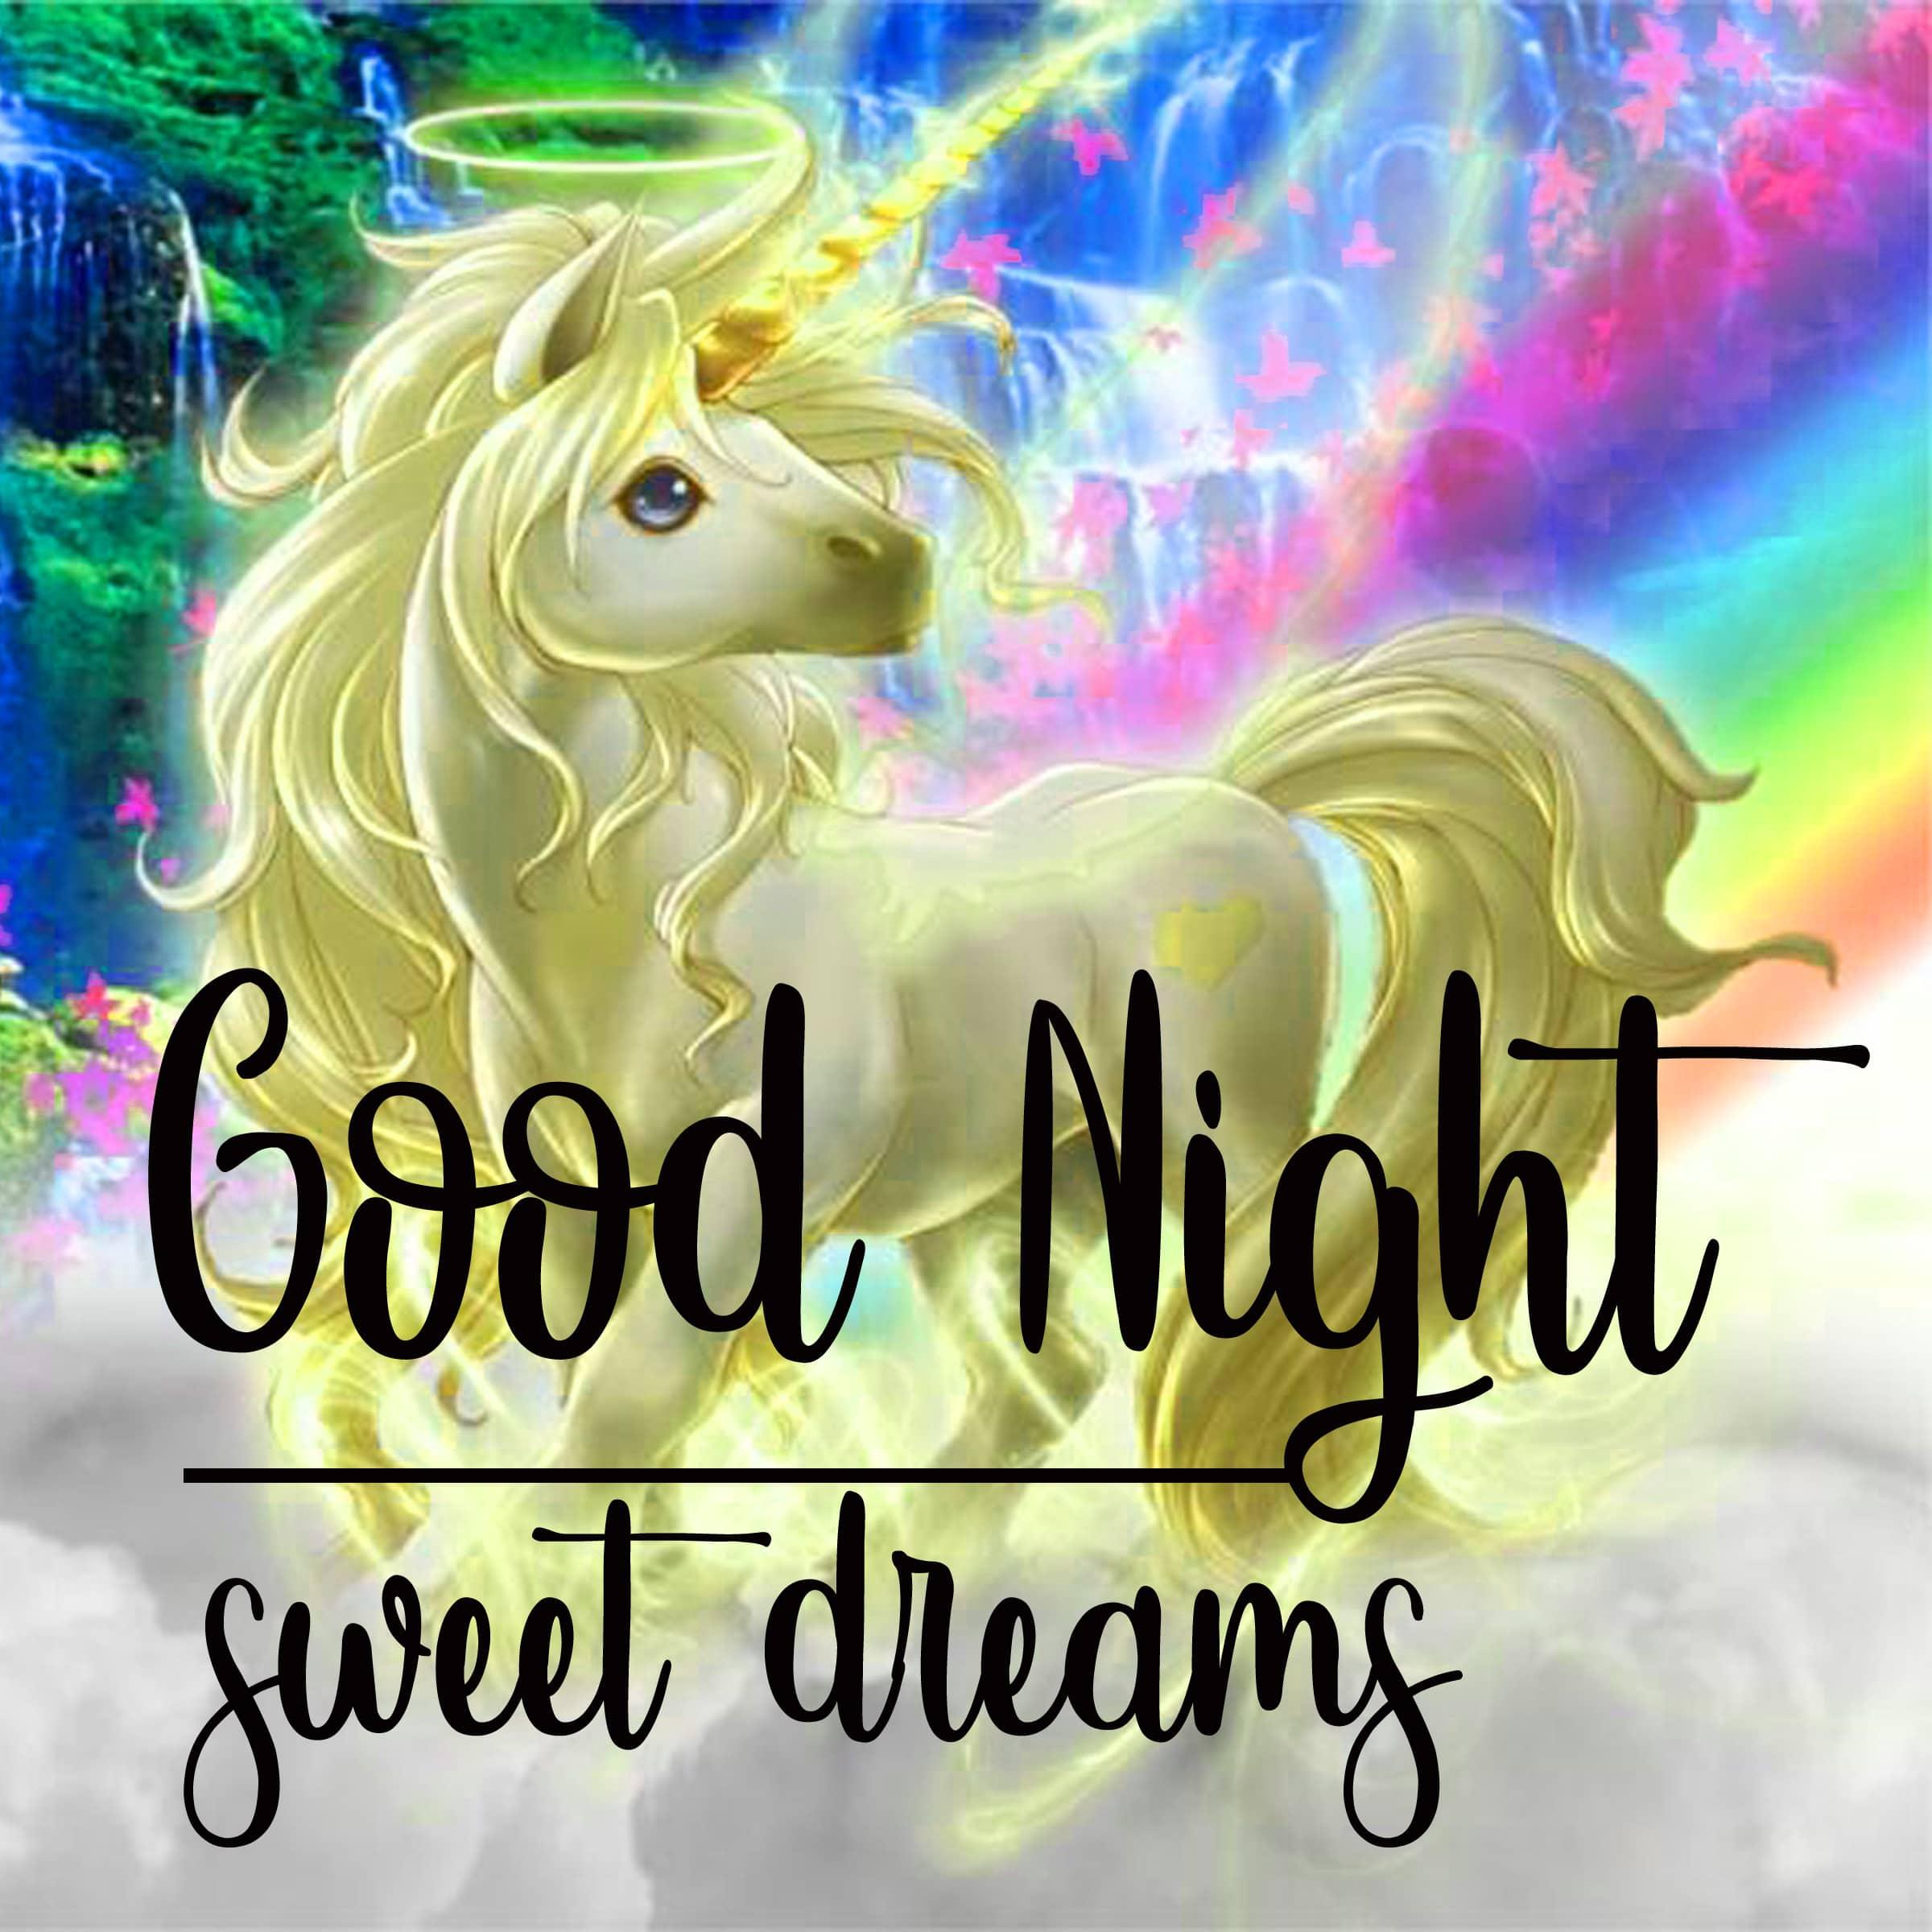 Good Night photo 4